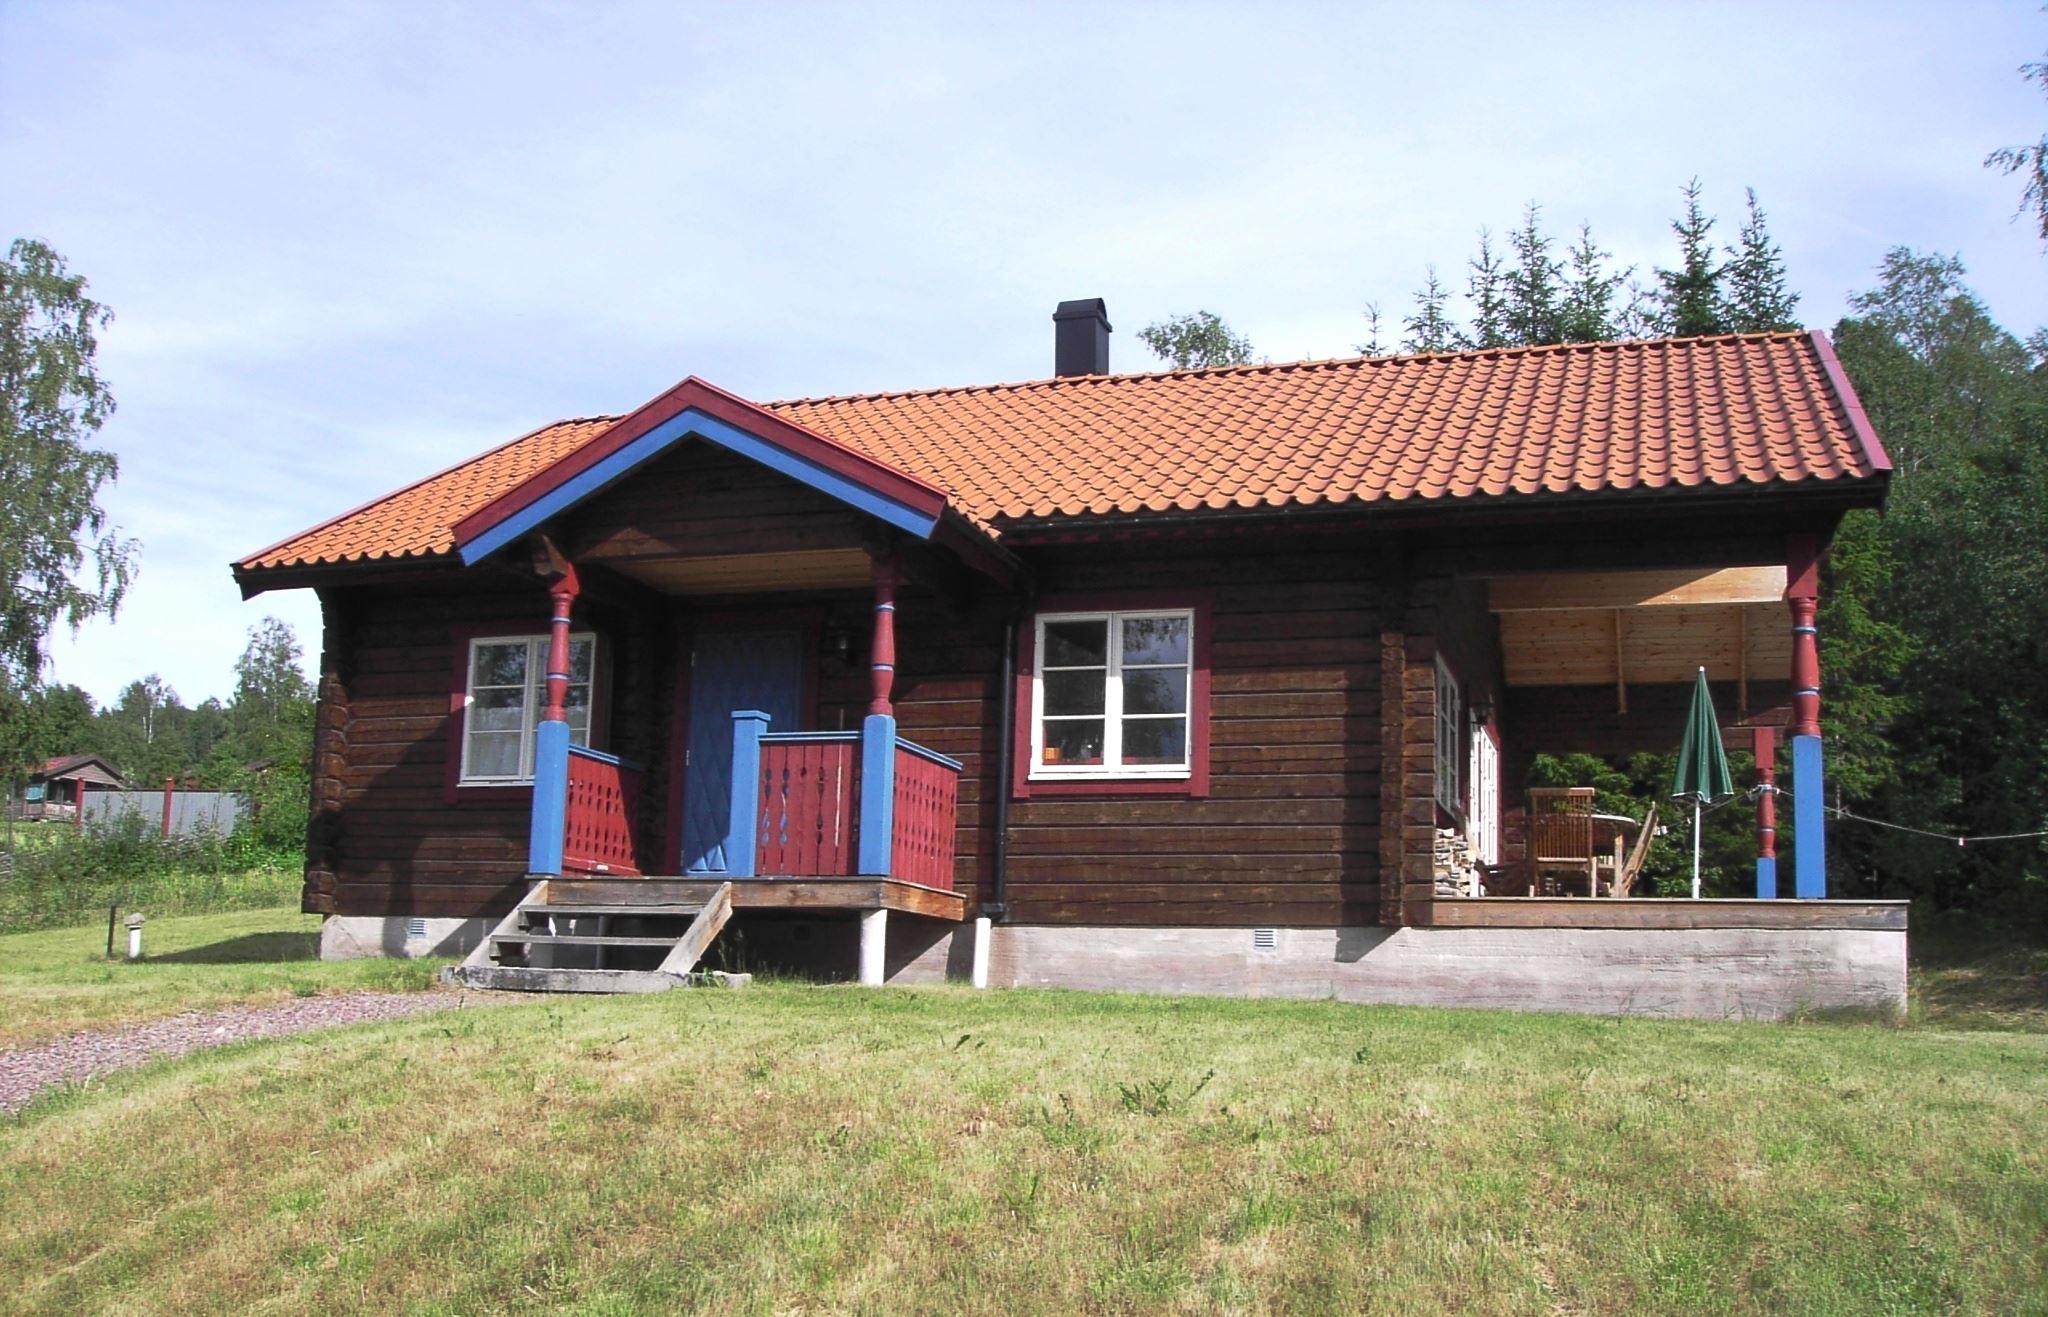 R223 Lerdal, 1,5 km S Rättvik